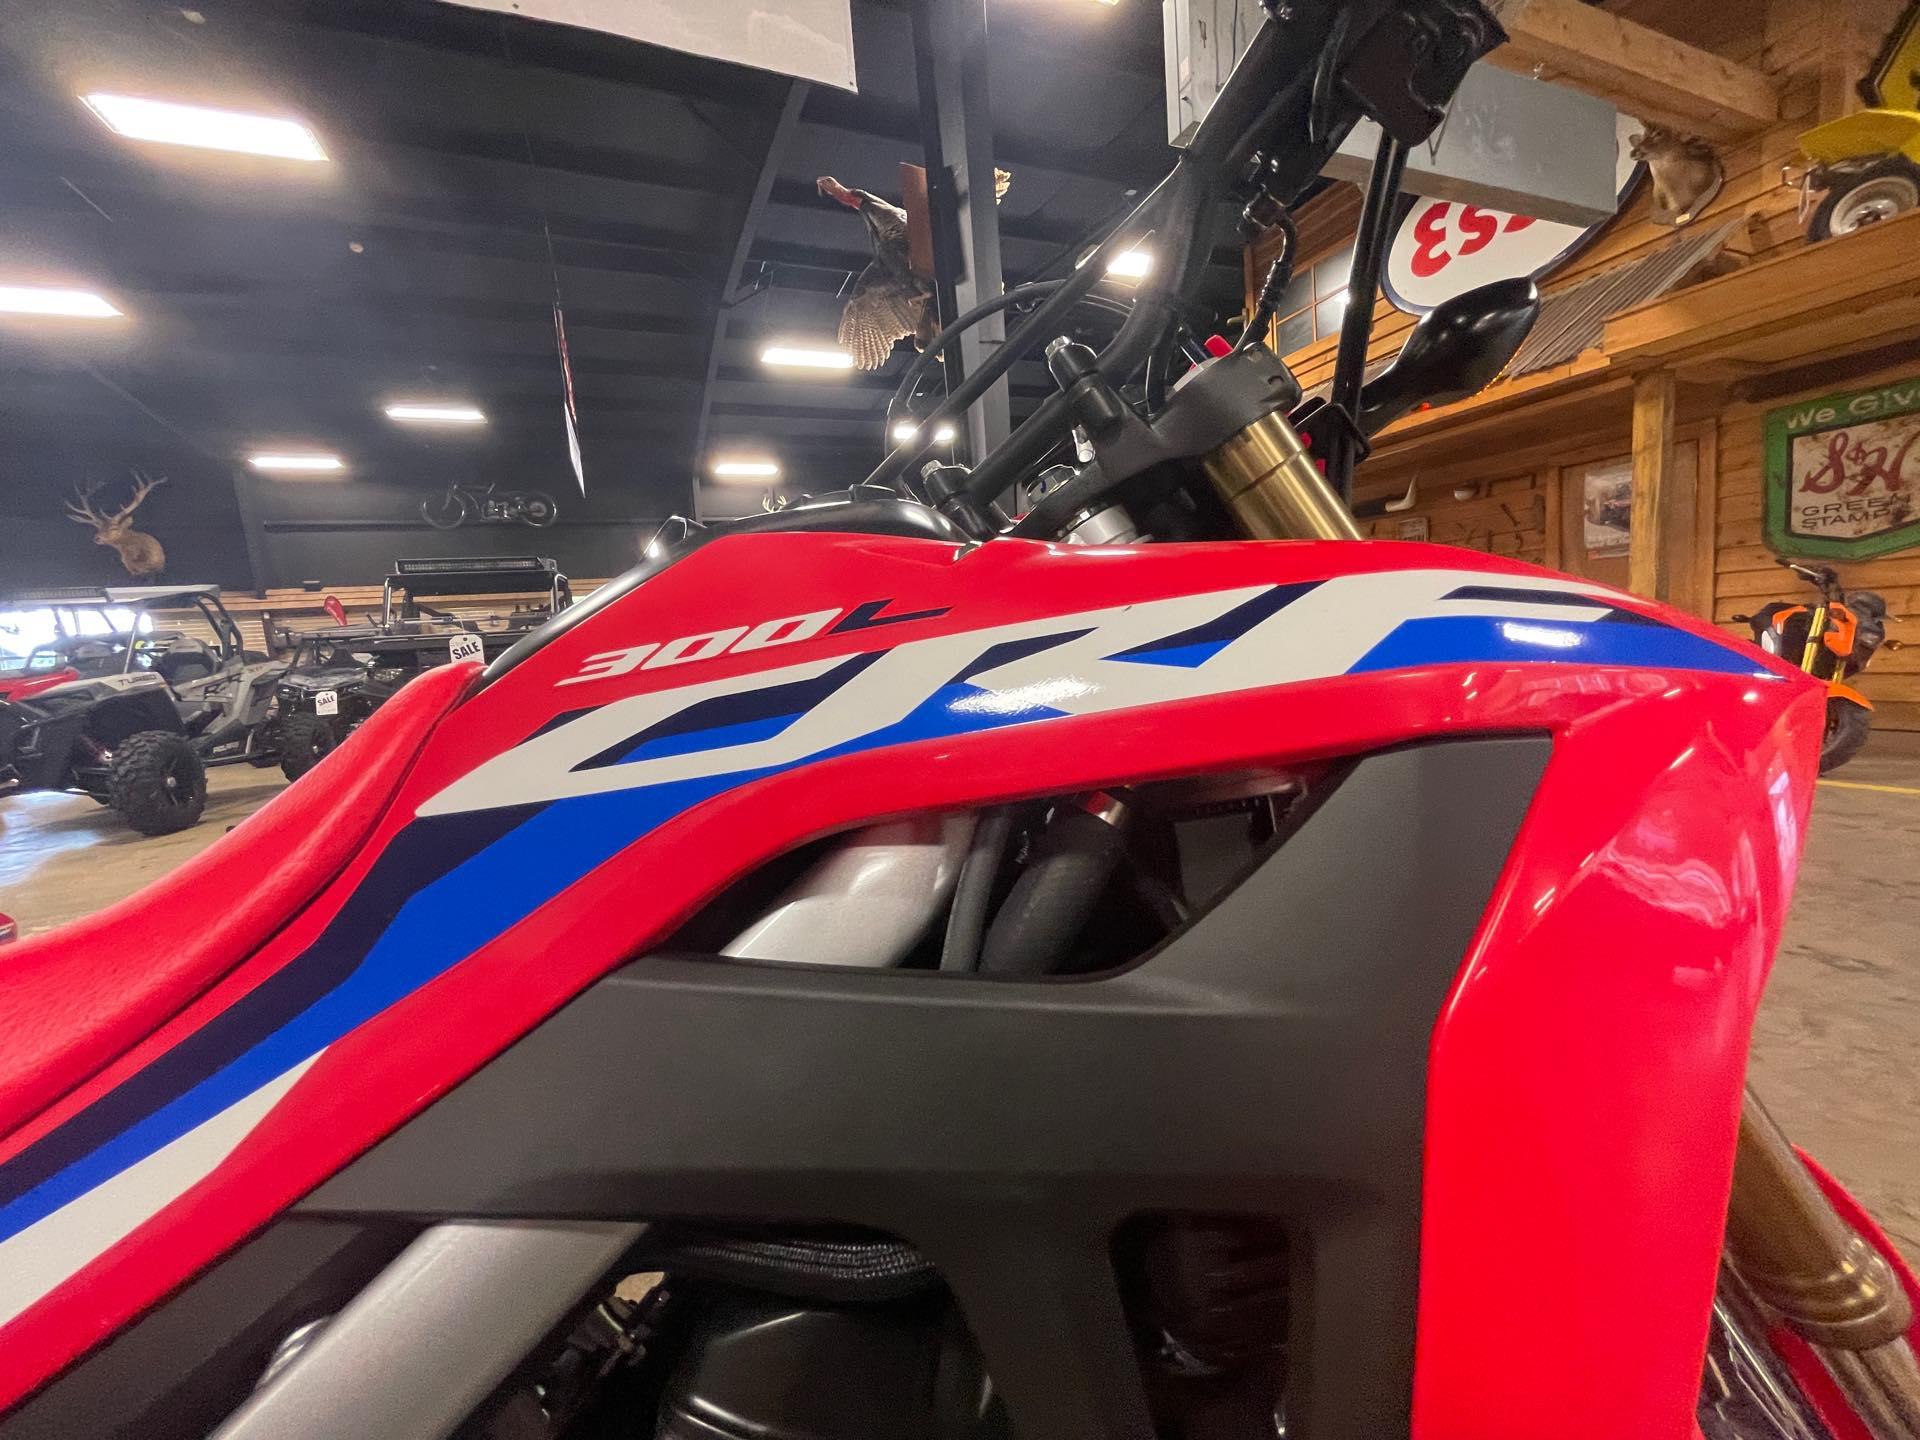 2021 HONDA CRF300LAM 300L ABS at ATV Zone, LLC